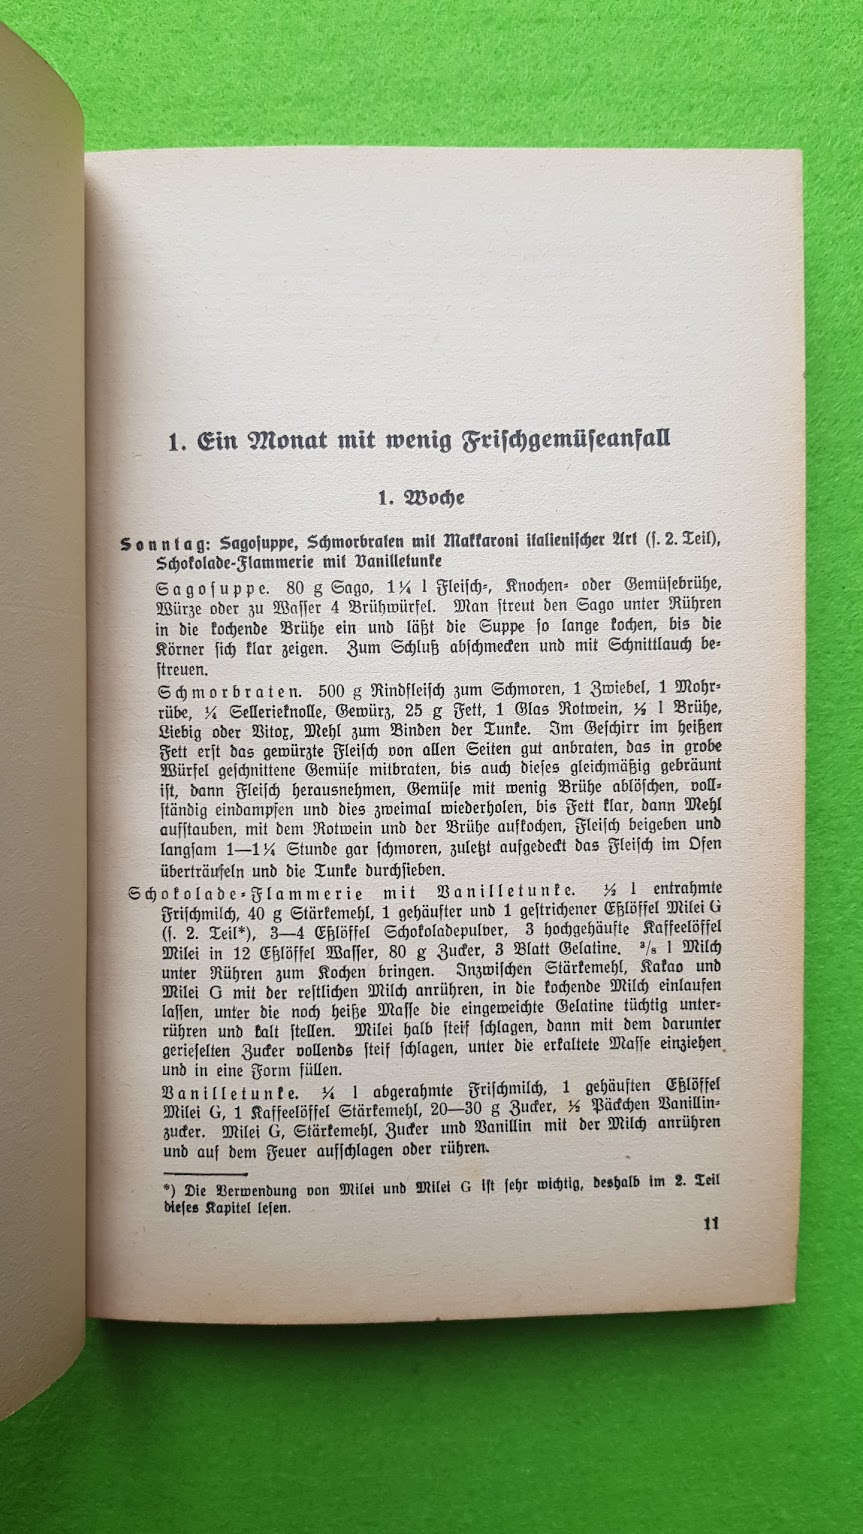 Eugen Bechtel, Nahrhaft, schmackhaft kochen - auch im Krieg!, 1940 - Winter-Speisezettel